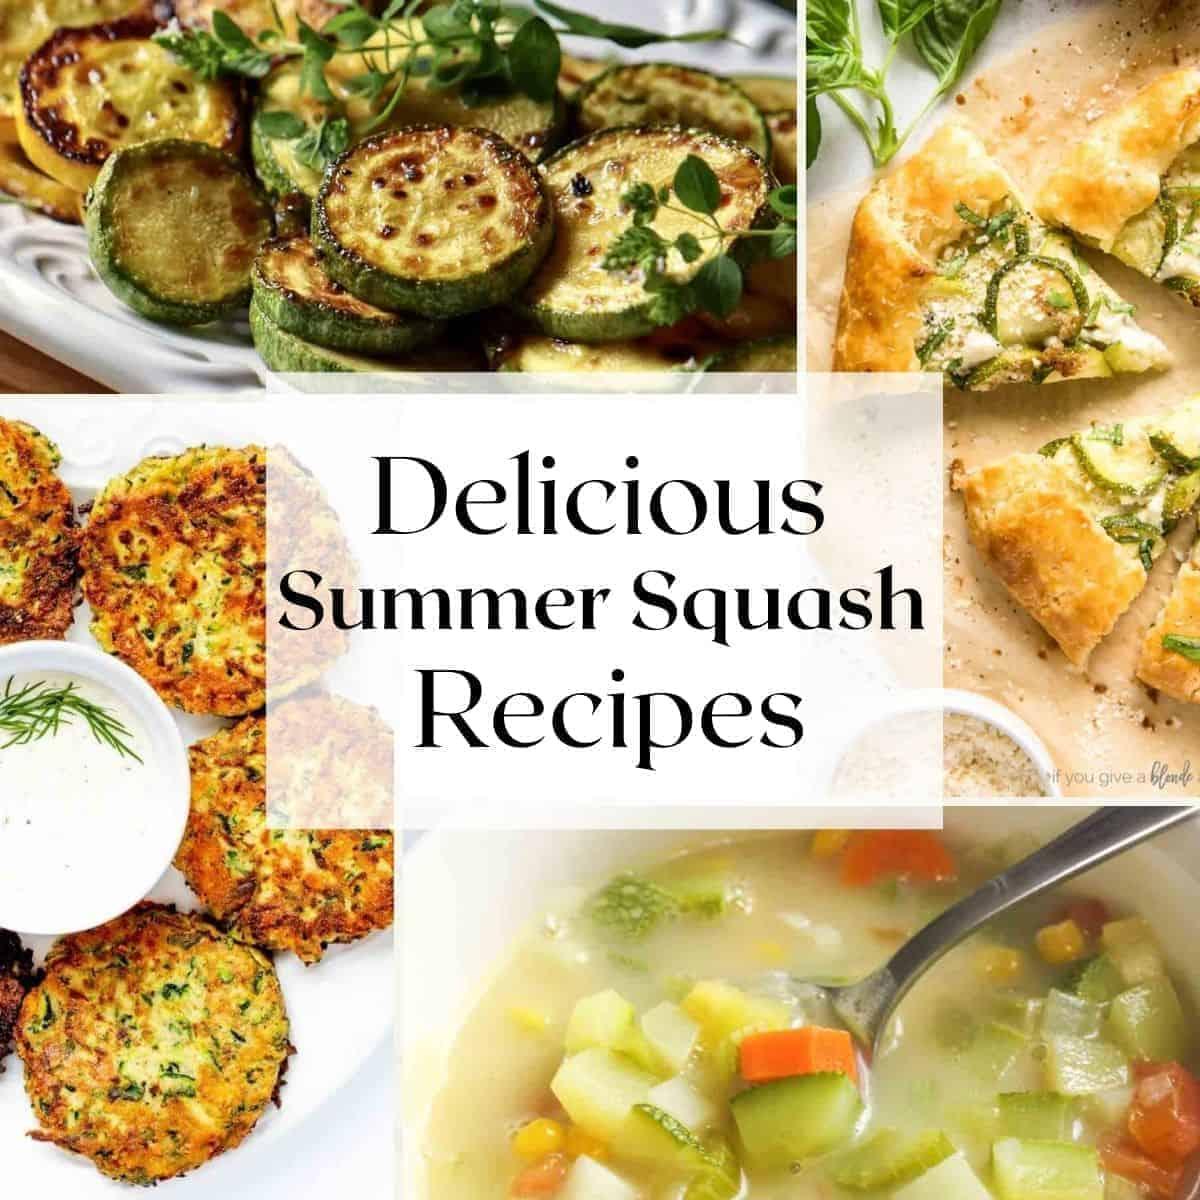 delicious summer squash recipes